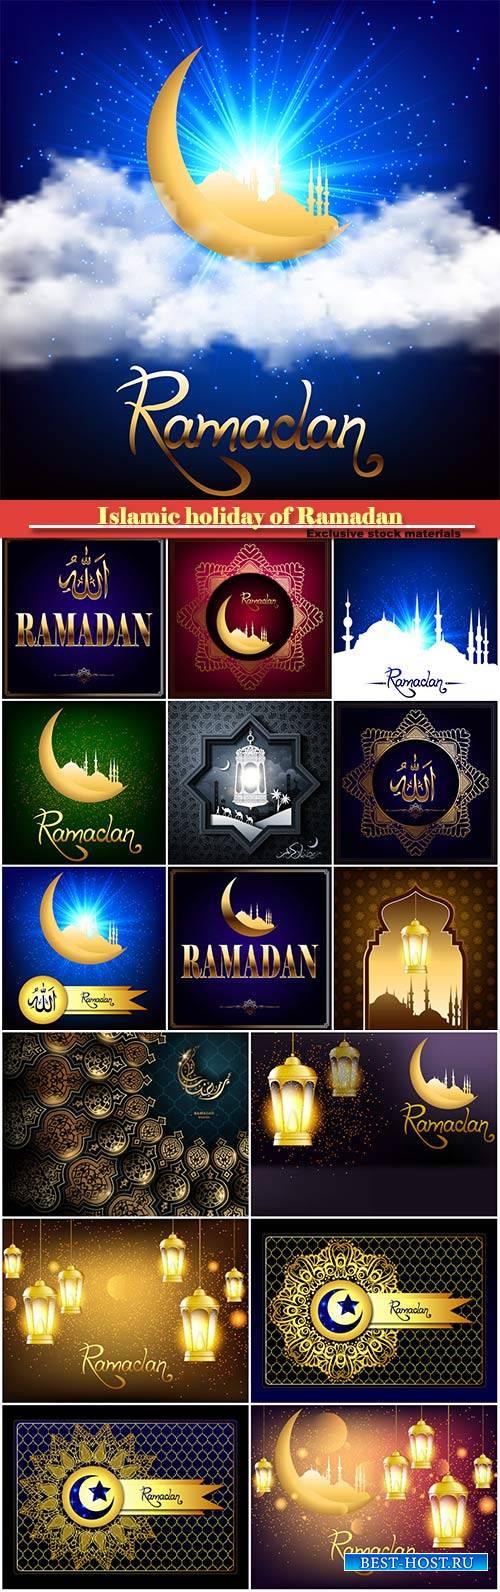 Vector background Islamic holiday of Ramadan